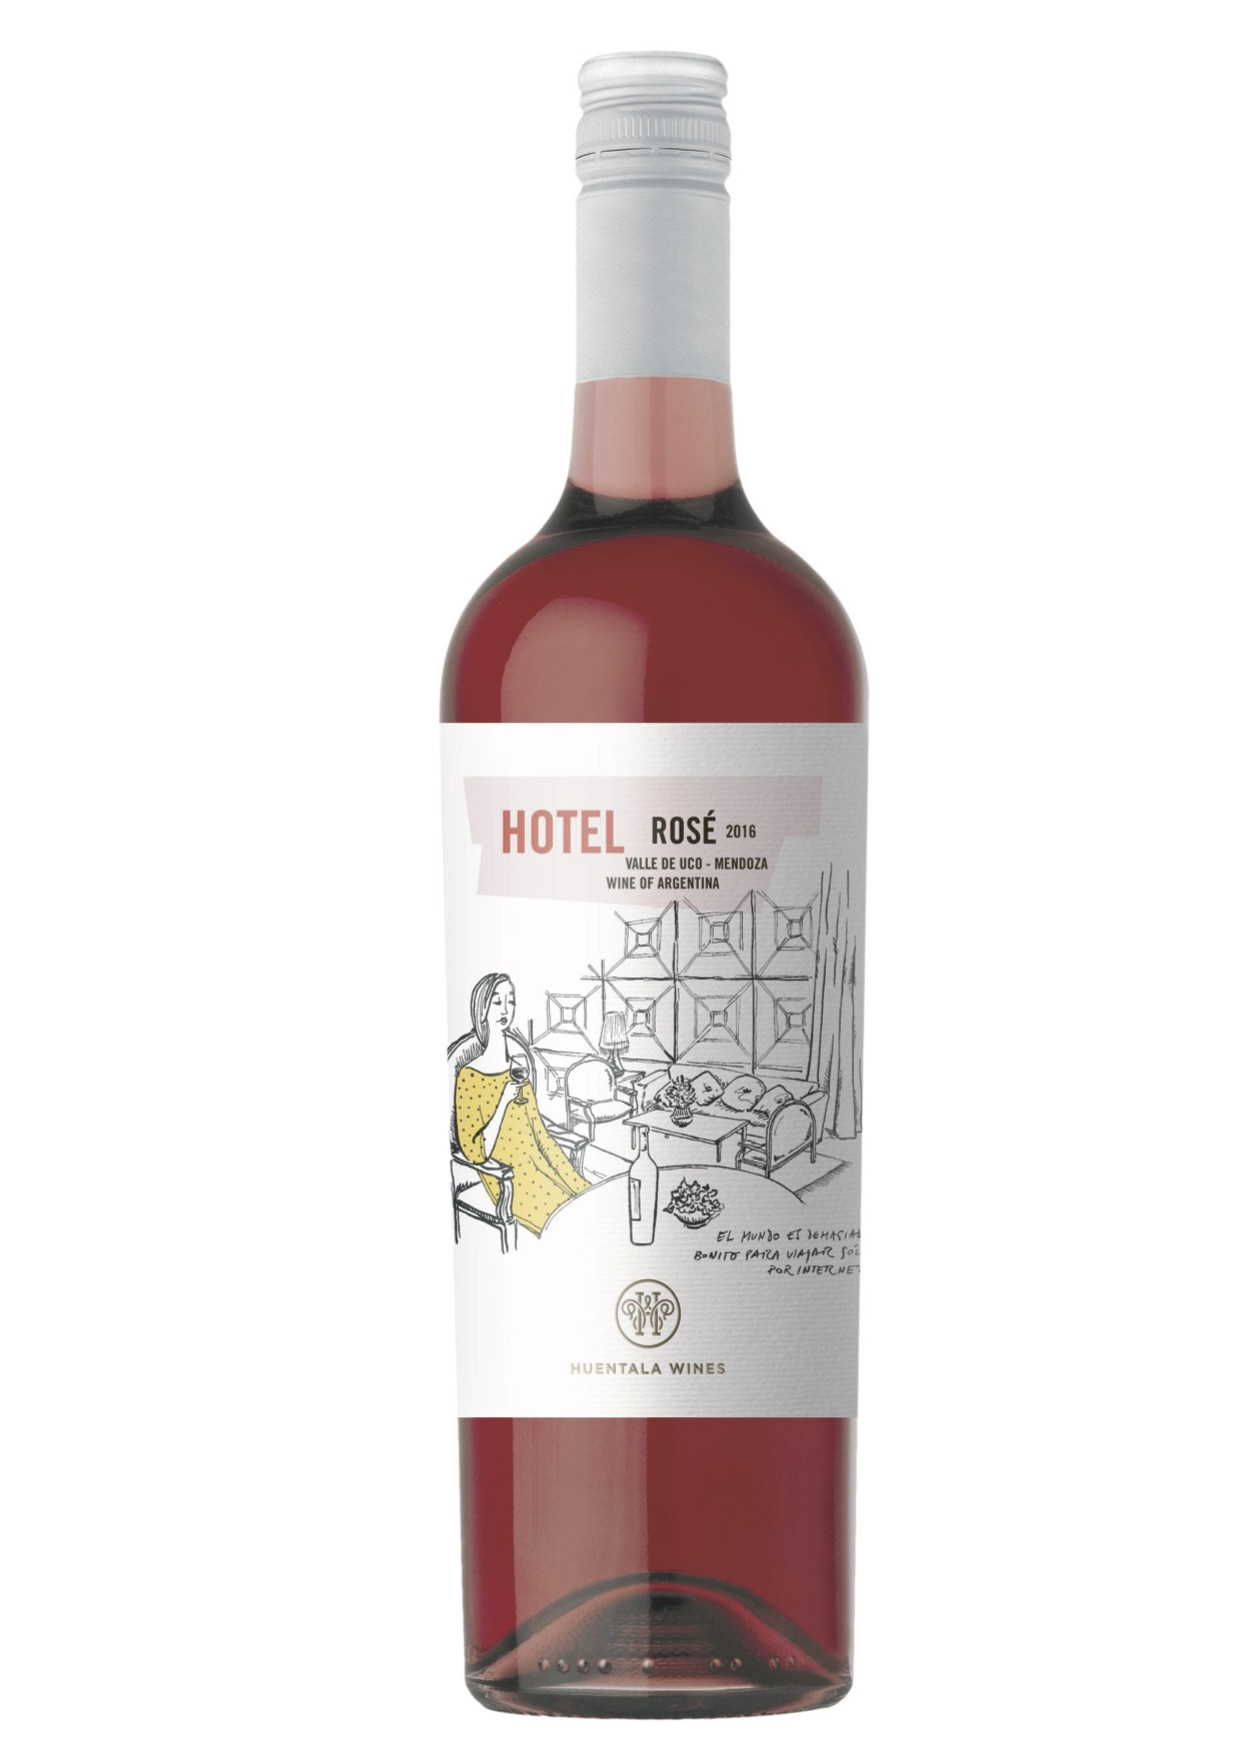 Hotel huentala wines